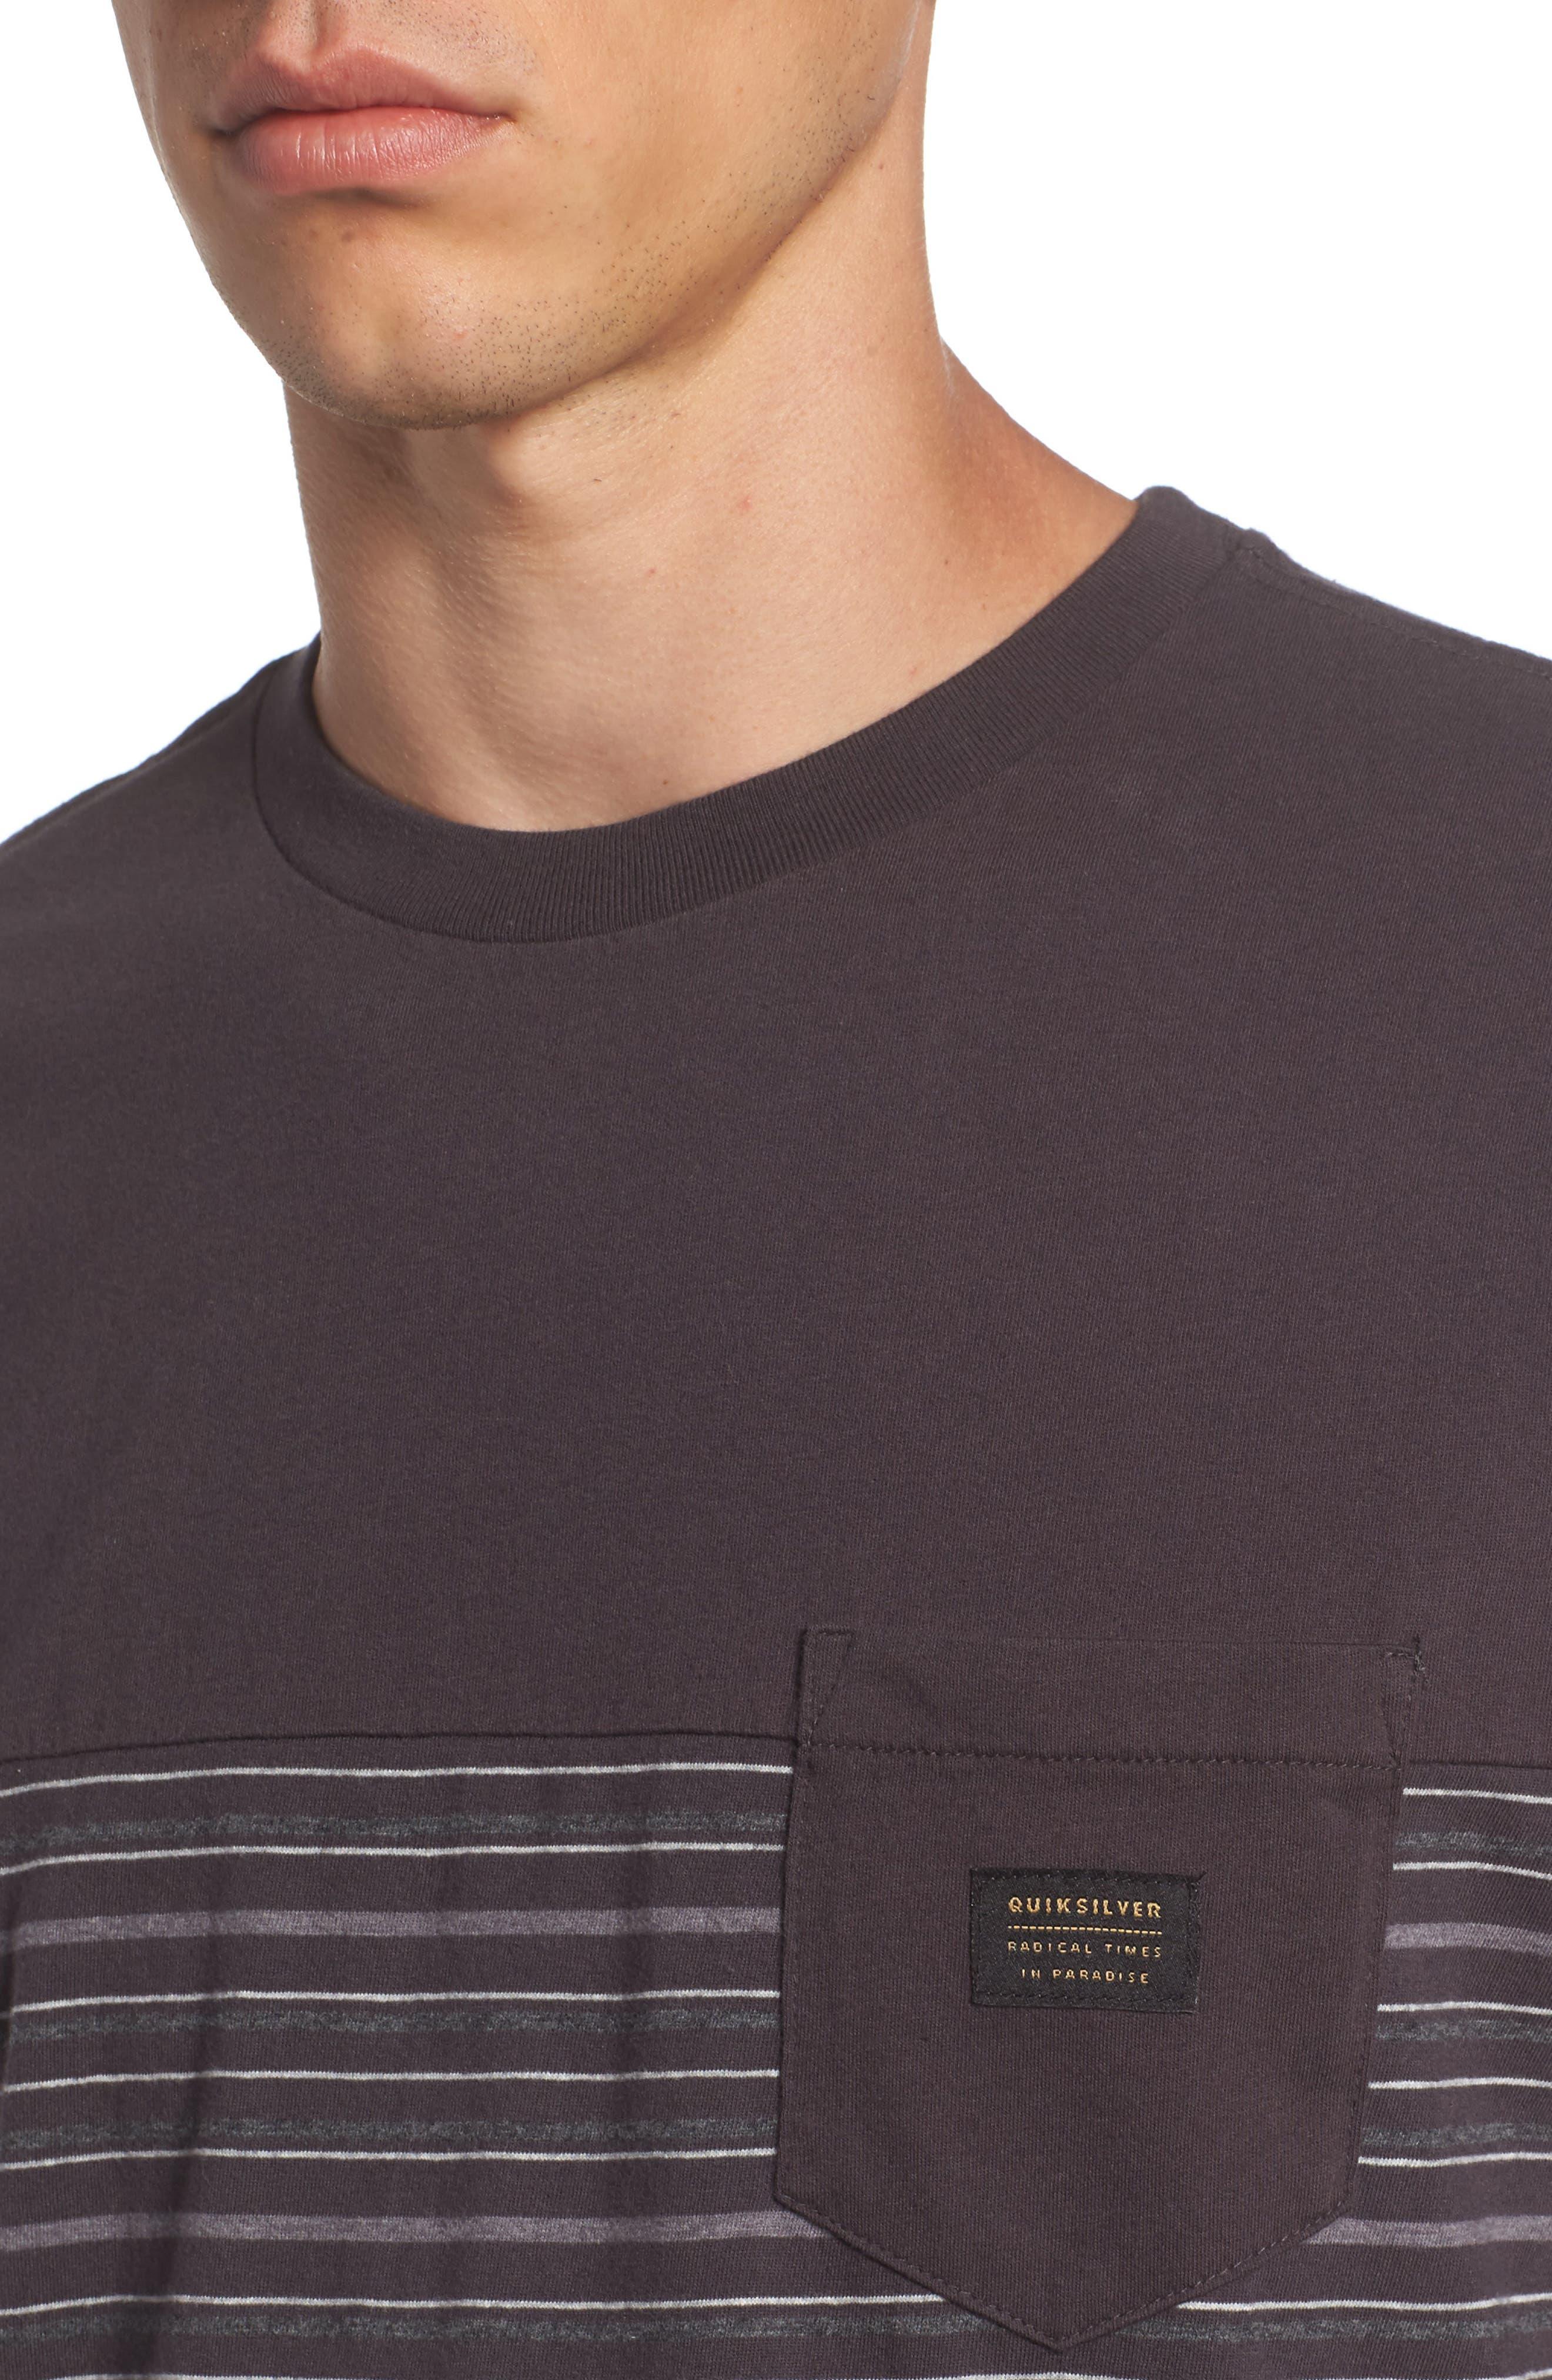 Full Tide T-Shirt,                             Alternate thumbnail 4, color,                             005